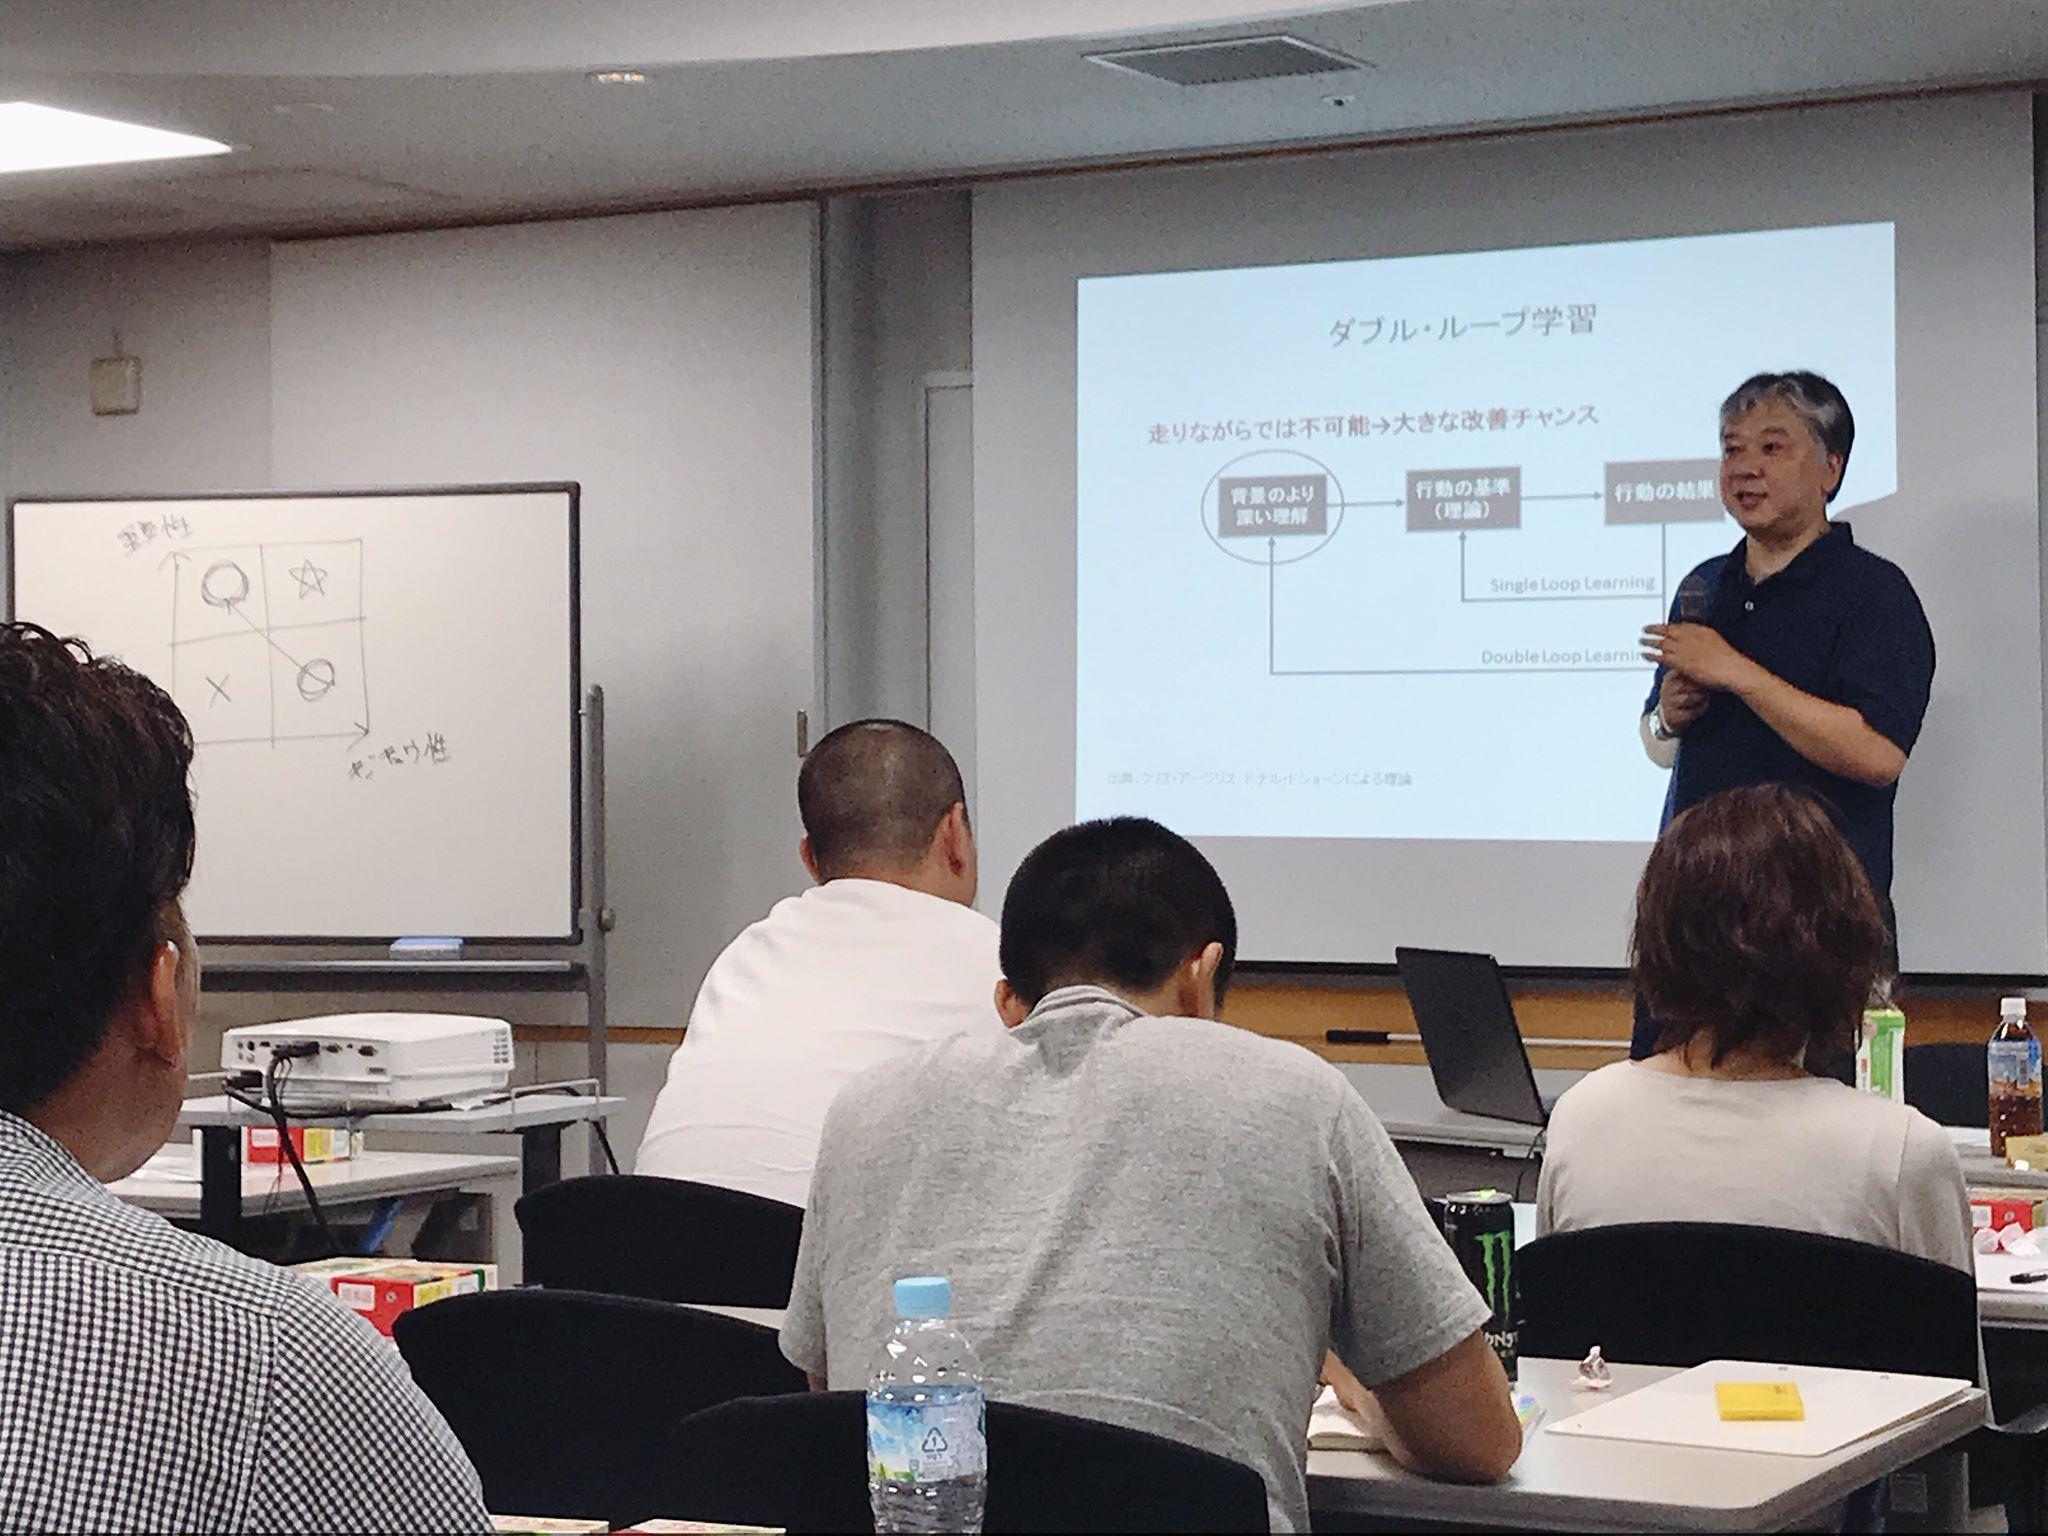 KAIGO LAB編集長による無料の講演会が行われました(大阪)